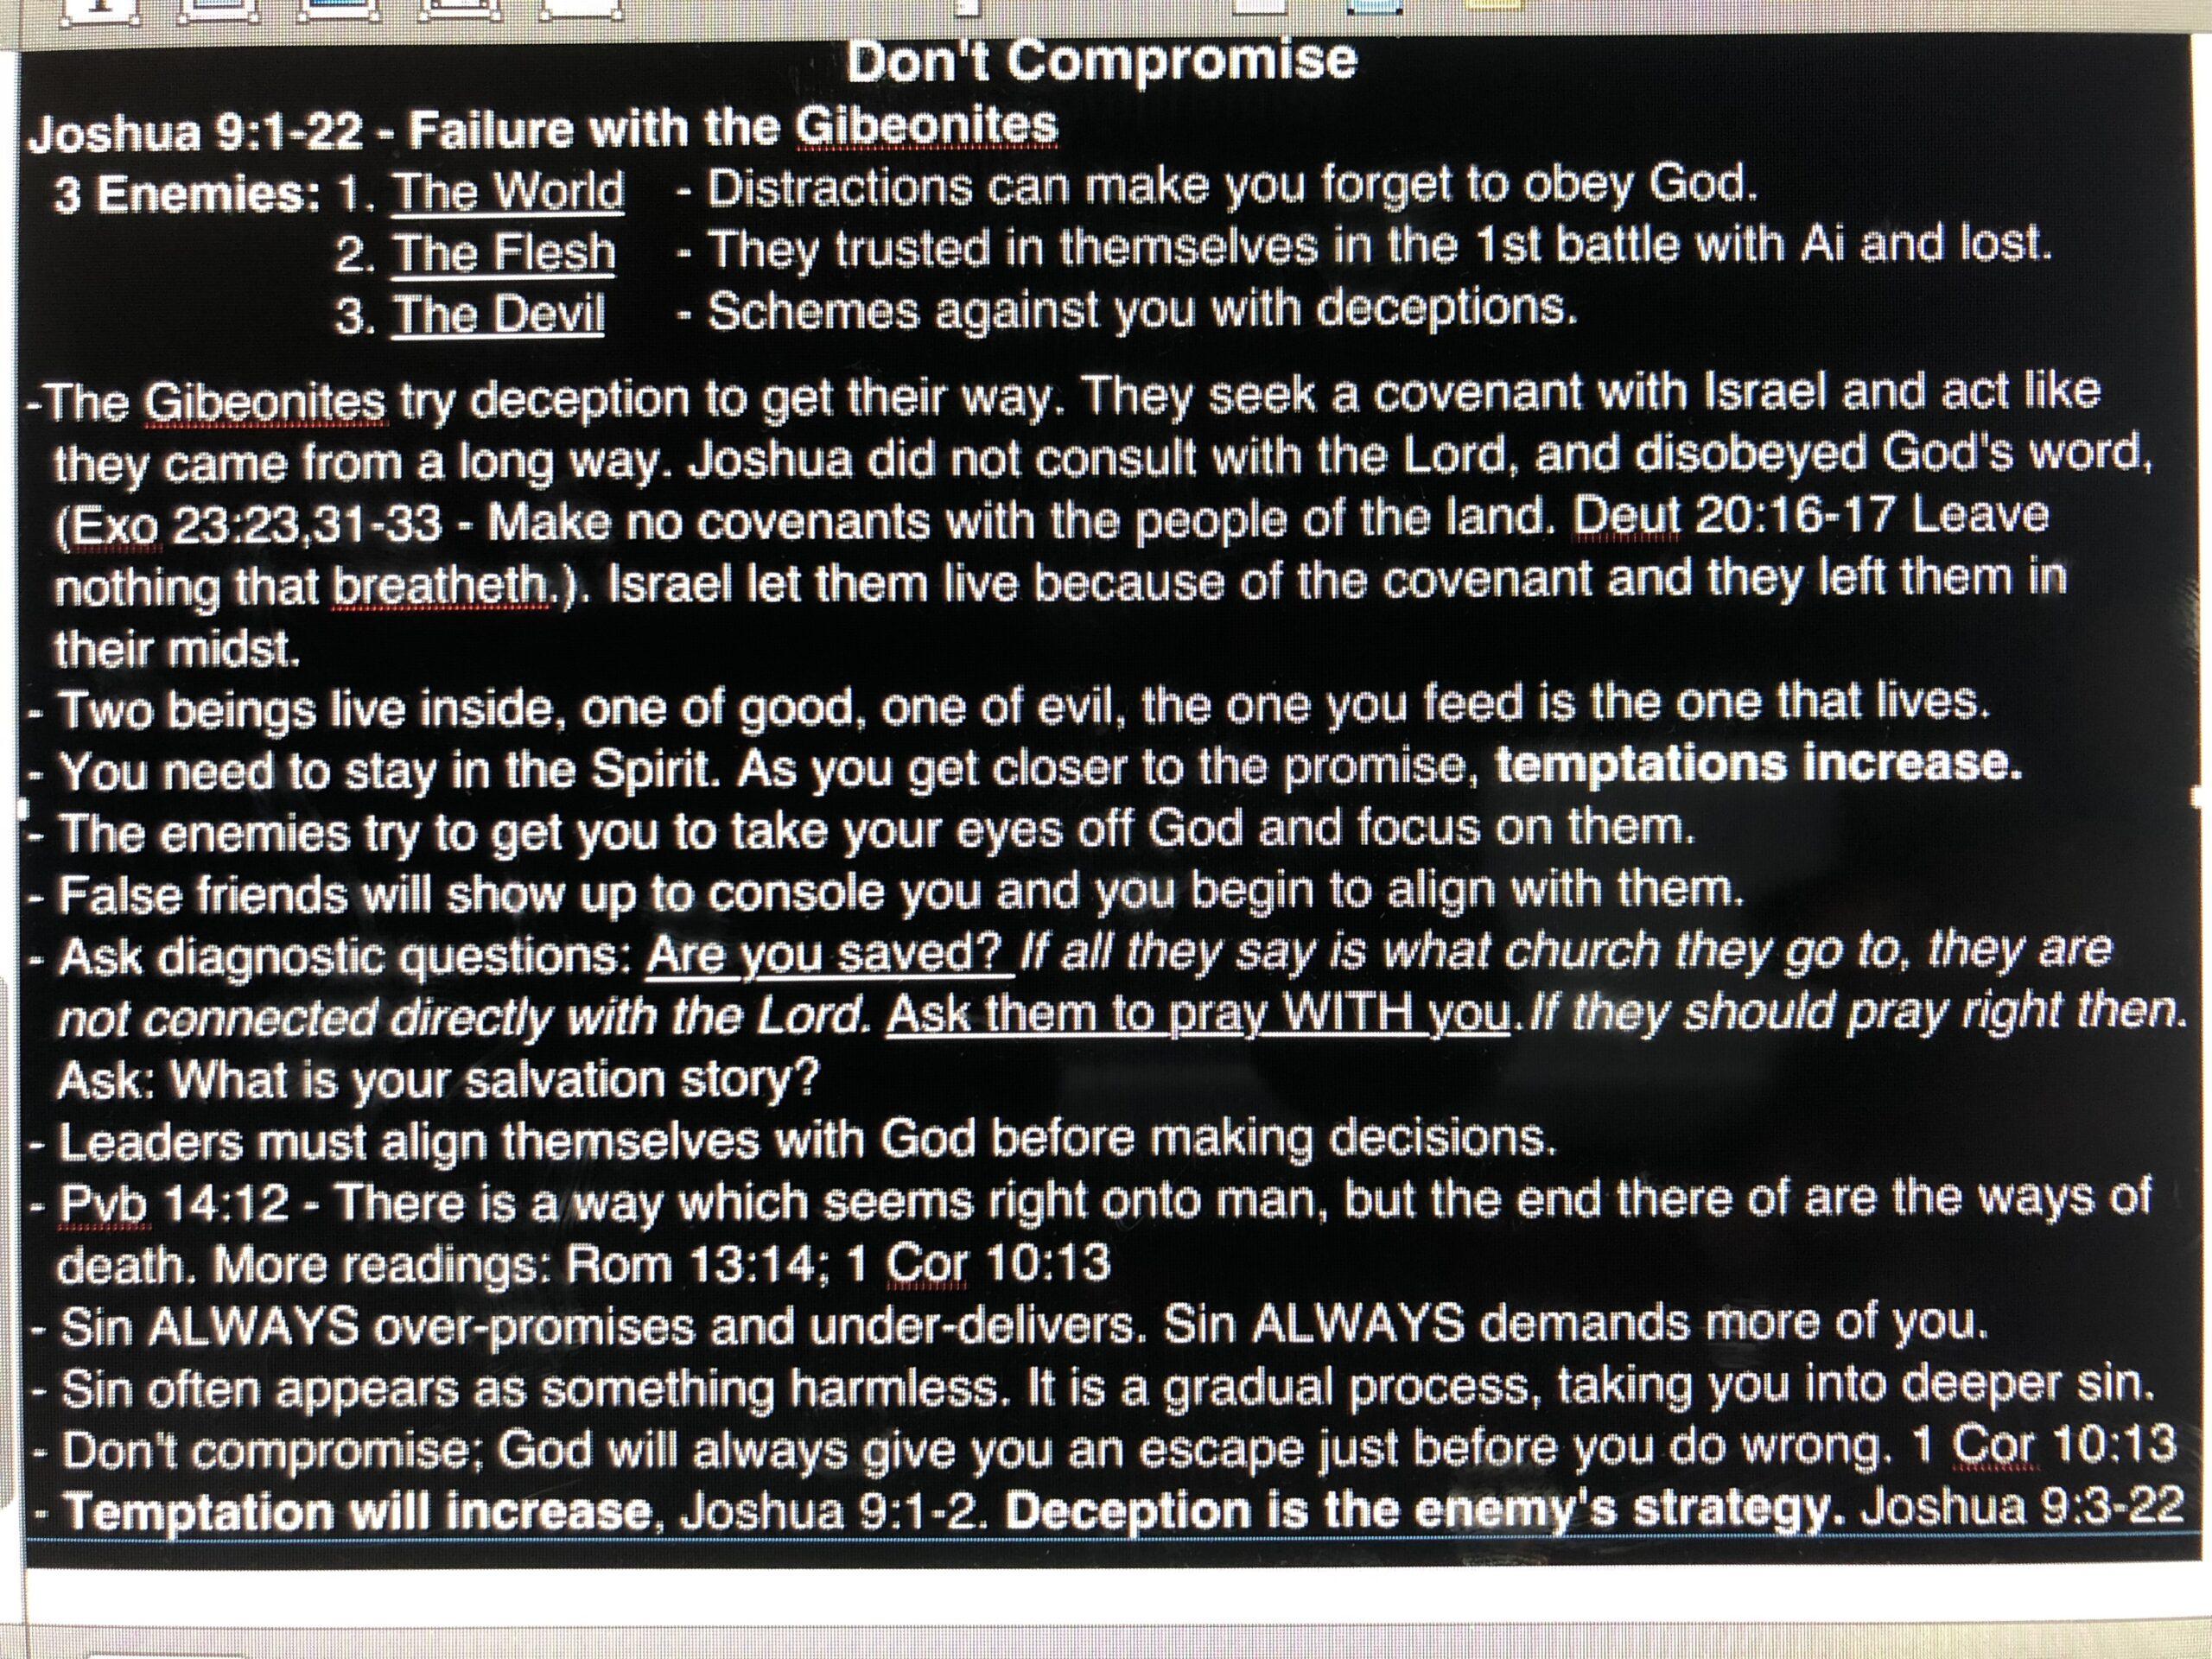 Don't Compromise - September 29, 2019